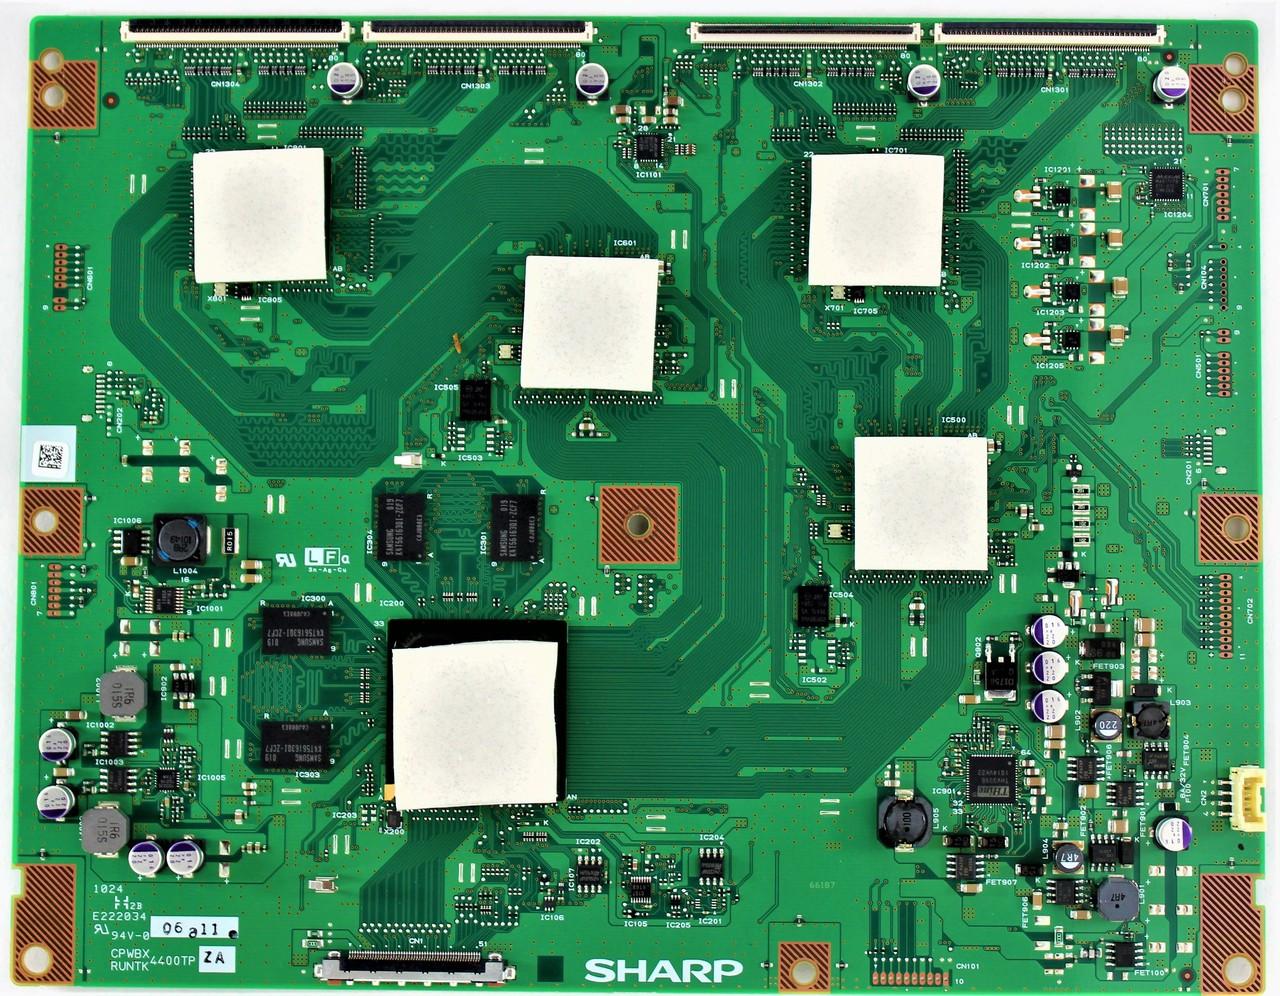 Sony RUNTK4400TPZA T-Con Board for KDL-46NX800